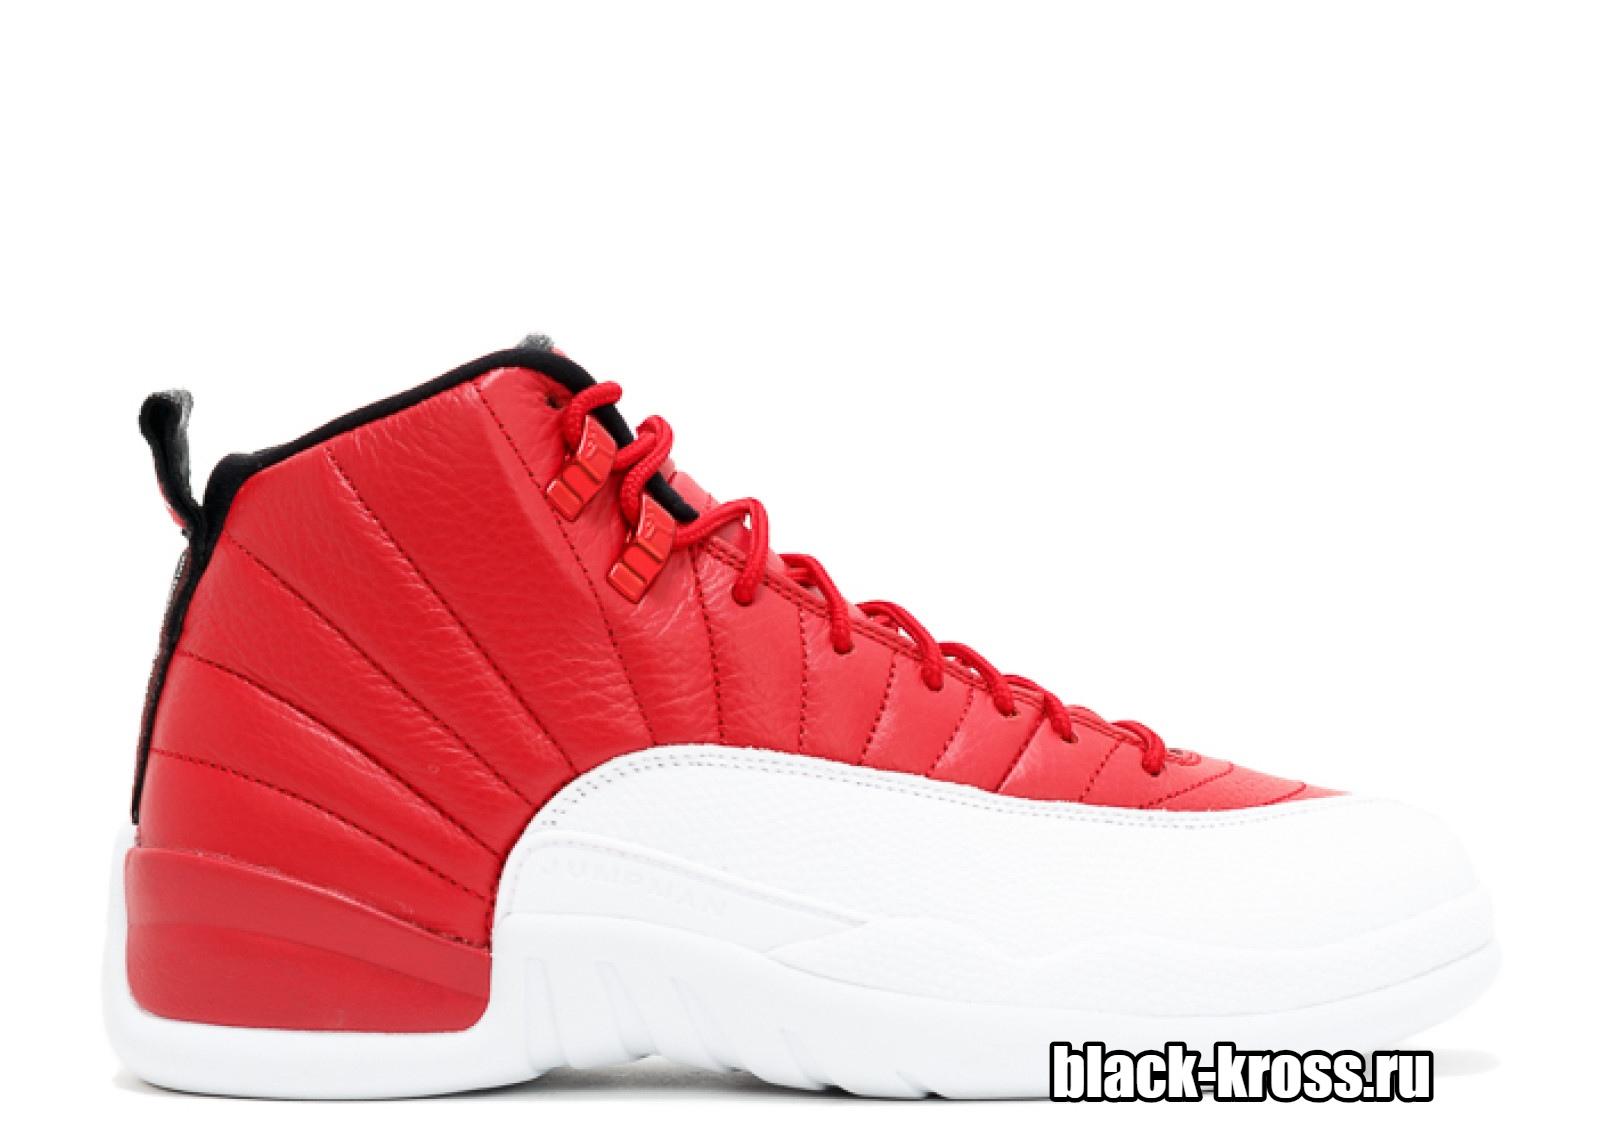 NIKE AIR JORDAN 12 RETRO Red & White (41-46)